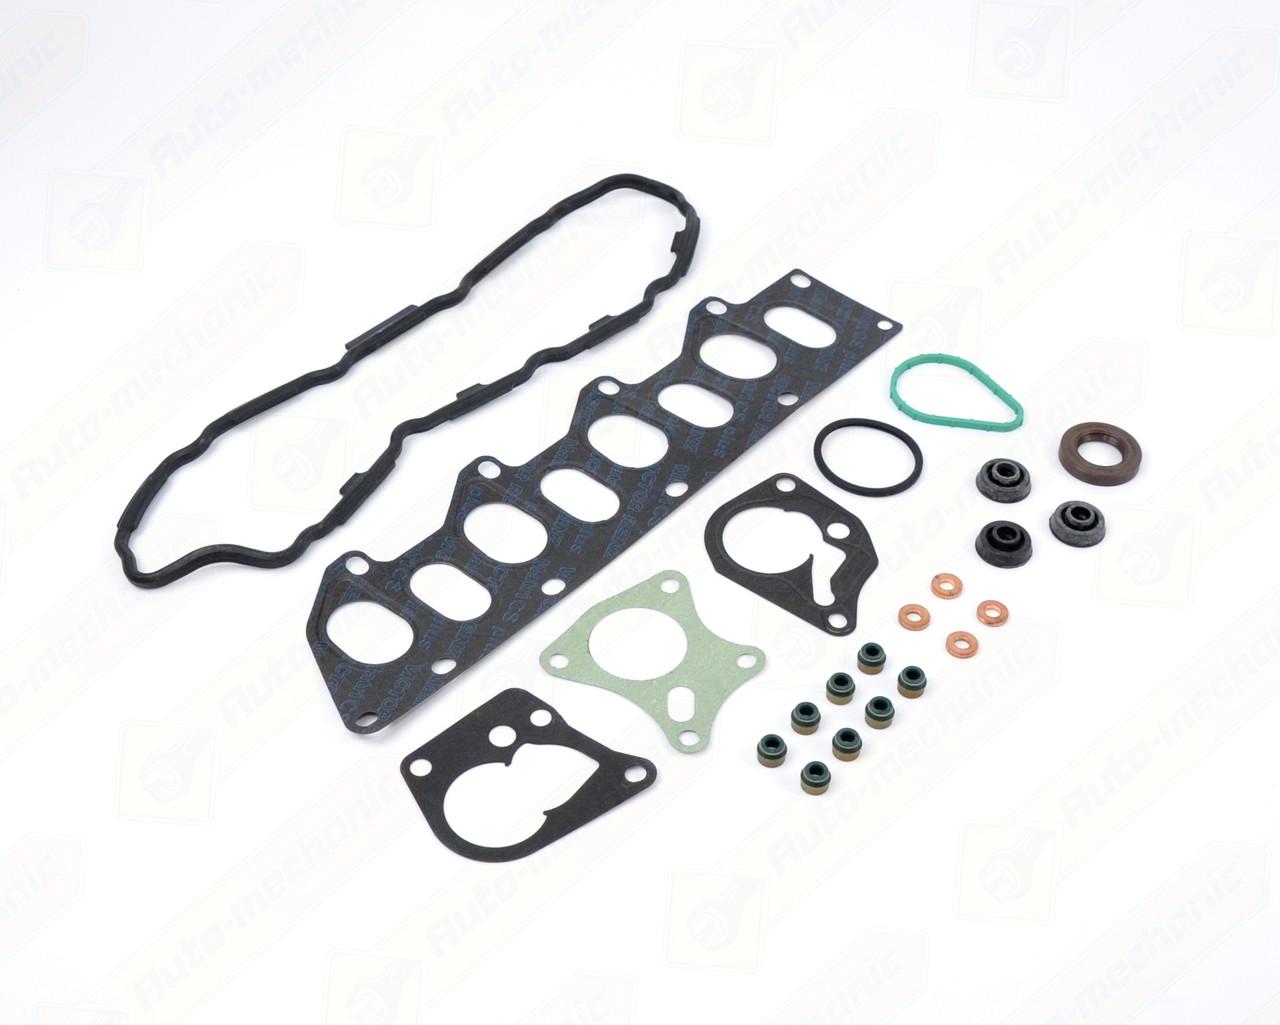 Комплект прокладок двигуна на Renault Master II 1998->2010 1.9 dCi - Victor Reinz (Німеччина) - 02-34409-01